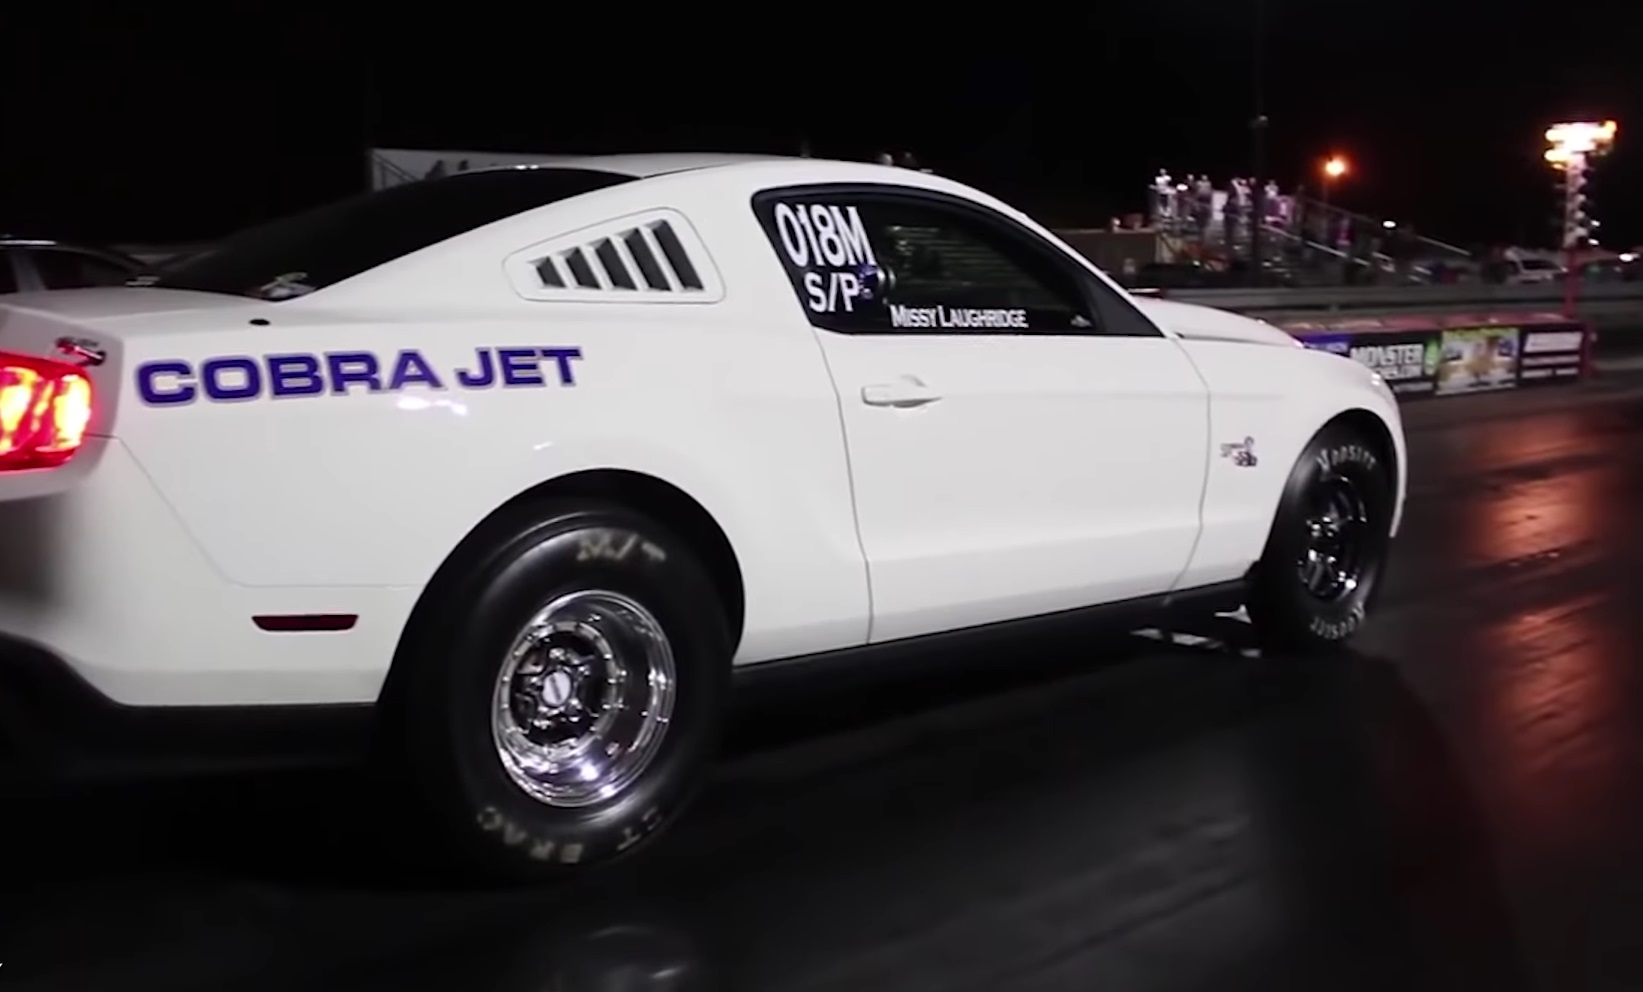 Video: 2012 Ford Mustang Cobra Jet vs Dodge Demon Drag Race